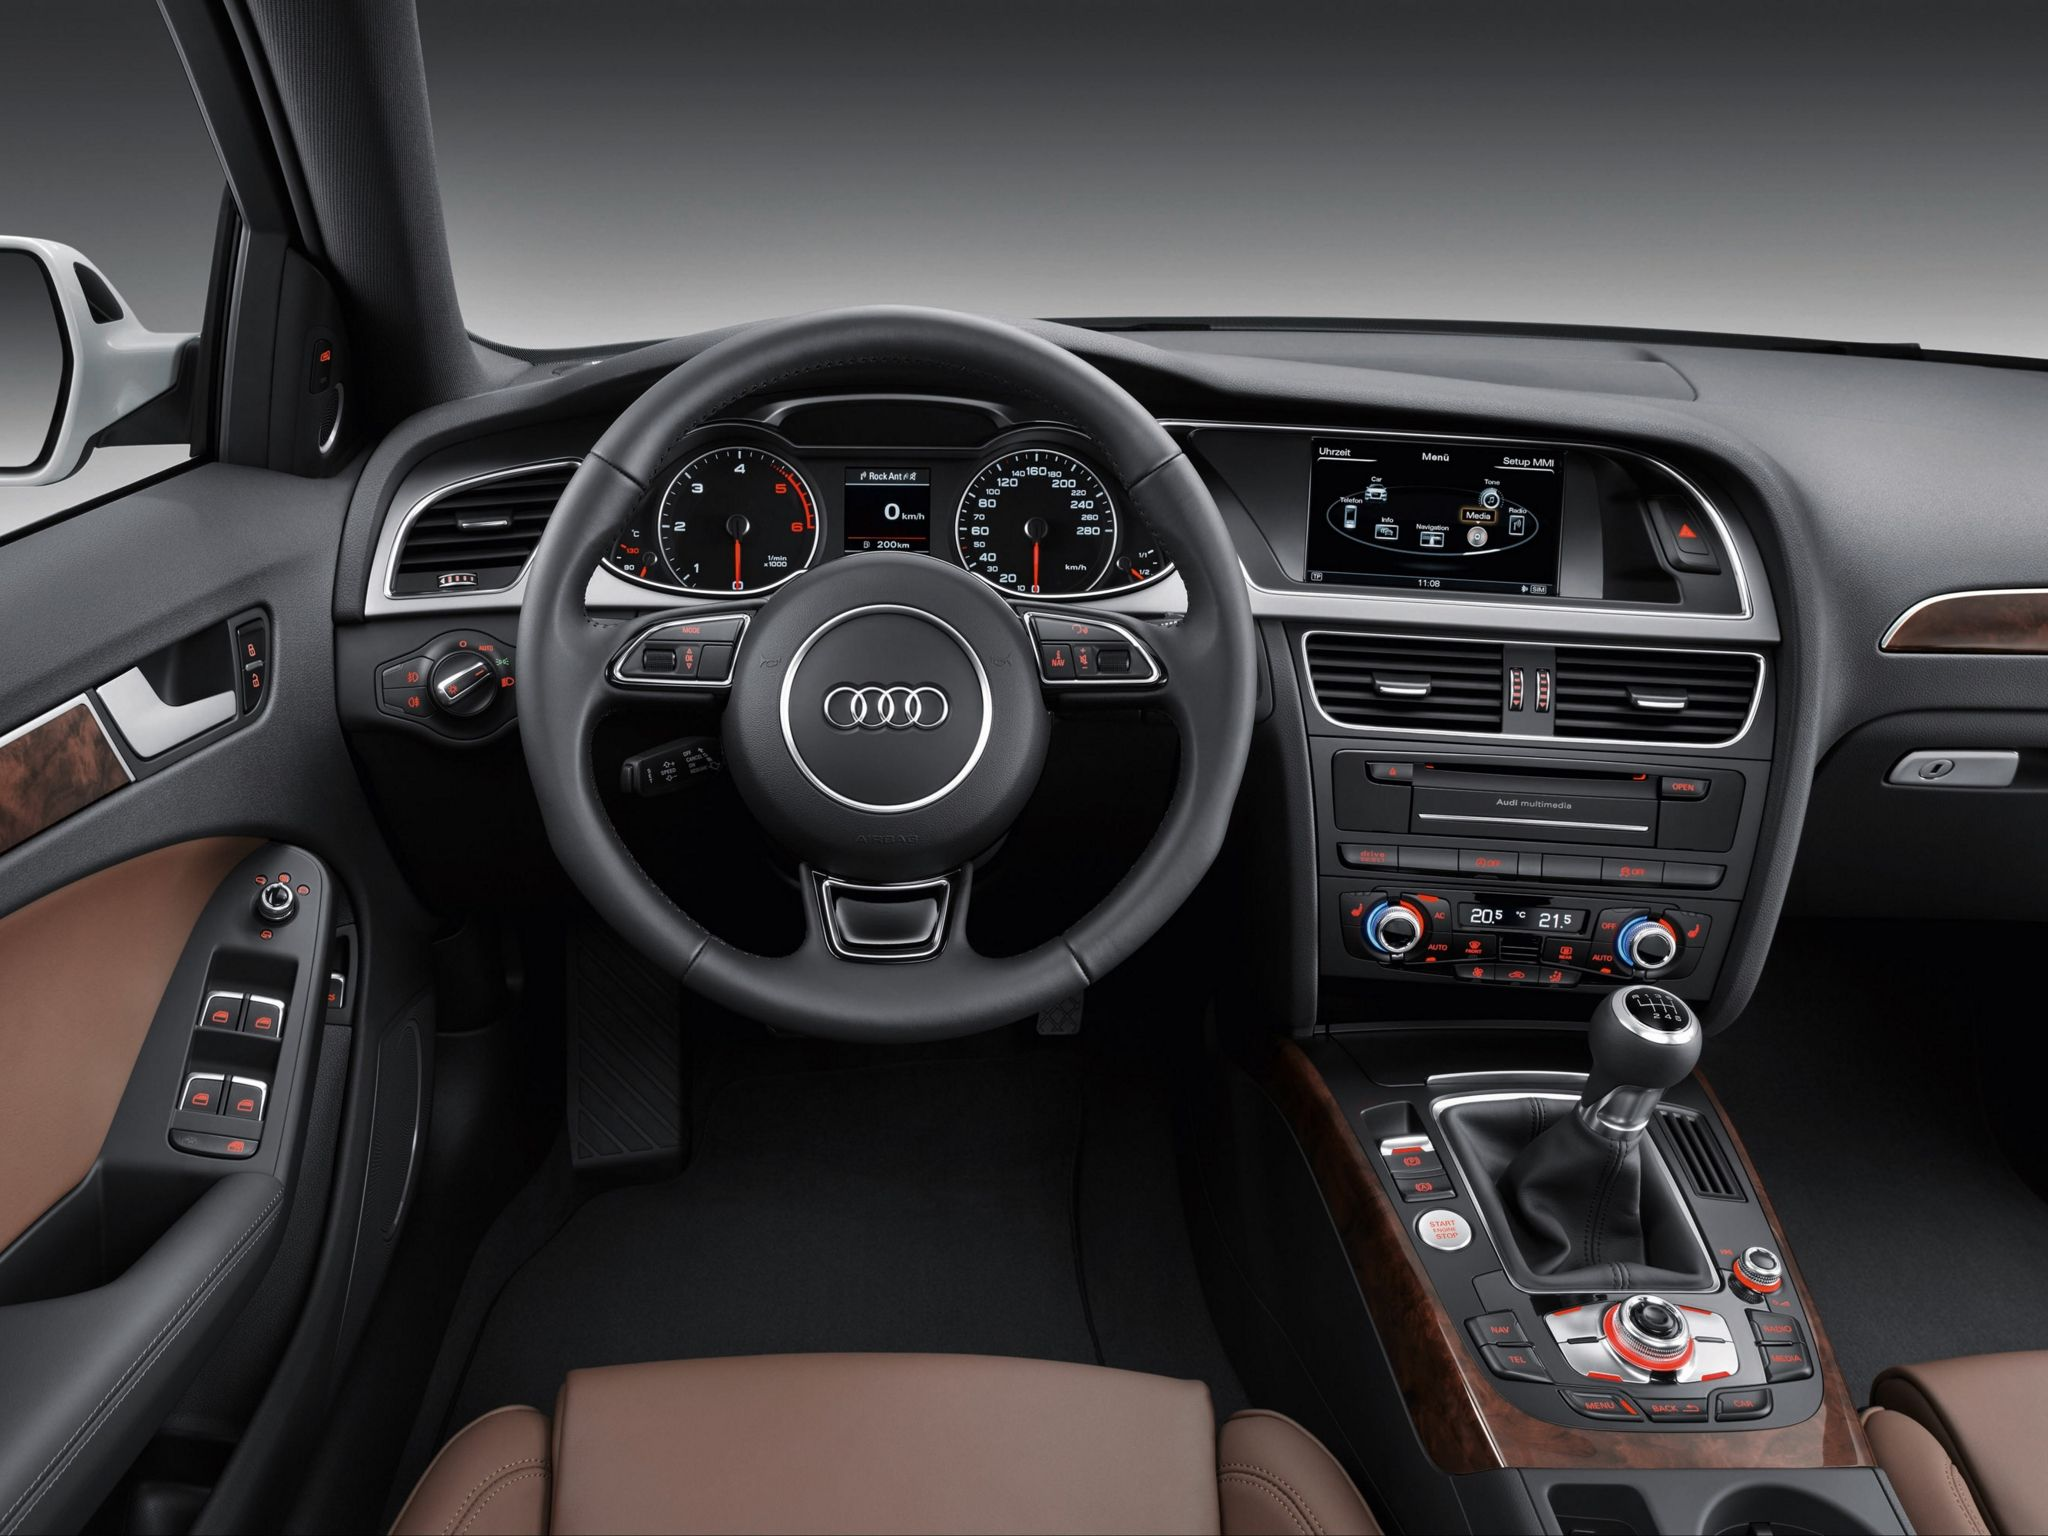 Audi A4 2 0 Tdi Quattro Avant B8 8k 2012 15 Audi A4 Audi Audi A4 Avant